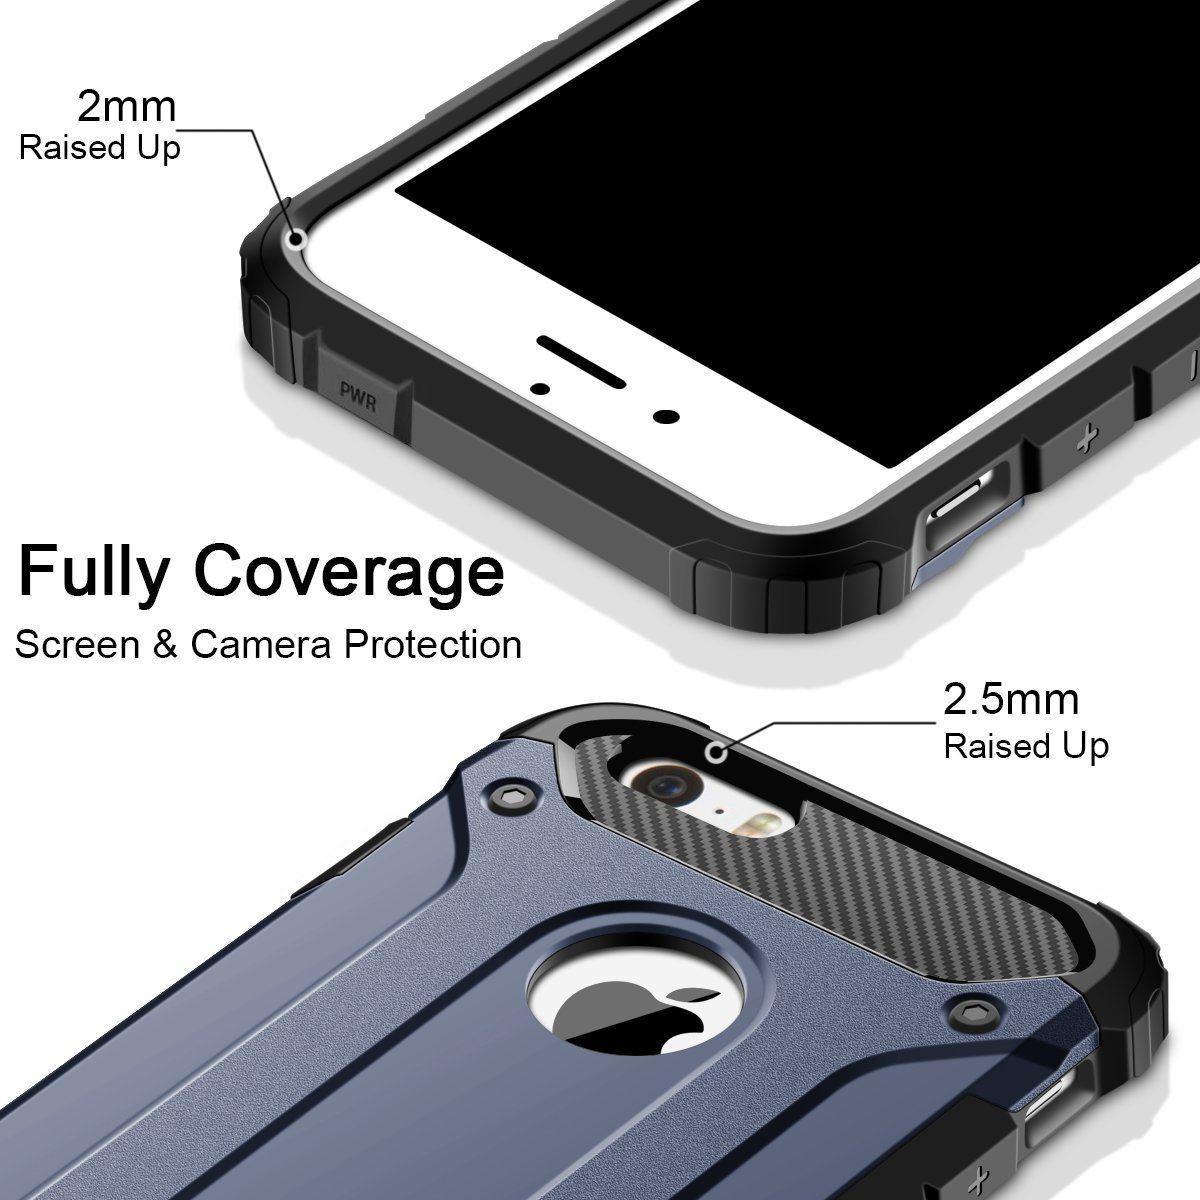 thumbnail 58 - For Apple iPhone 11 Pro Max XR Xs X 8 7 Plus 6 5 Se Case Cover Impact Heavy Duty